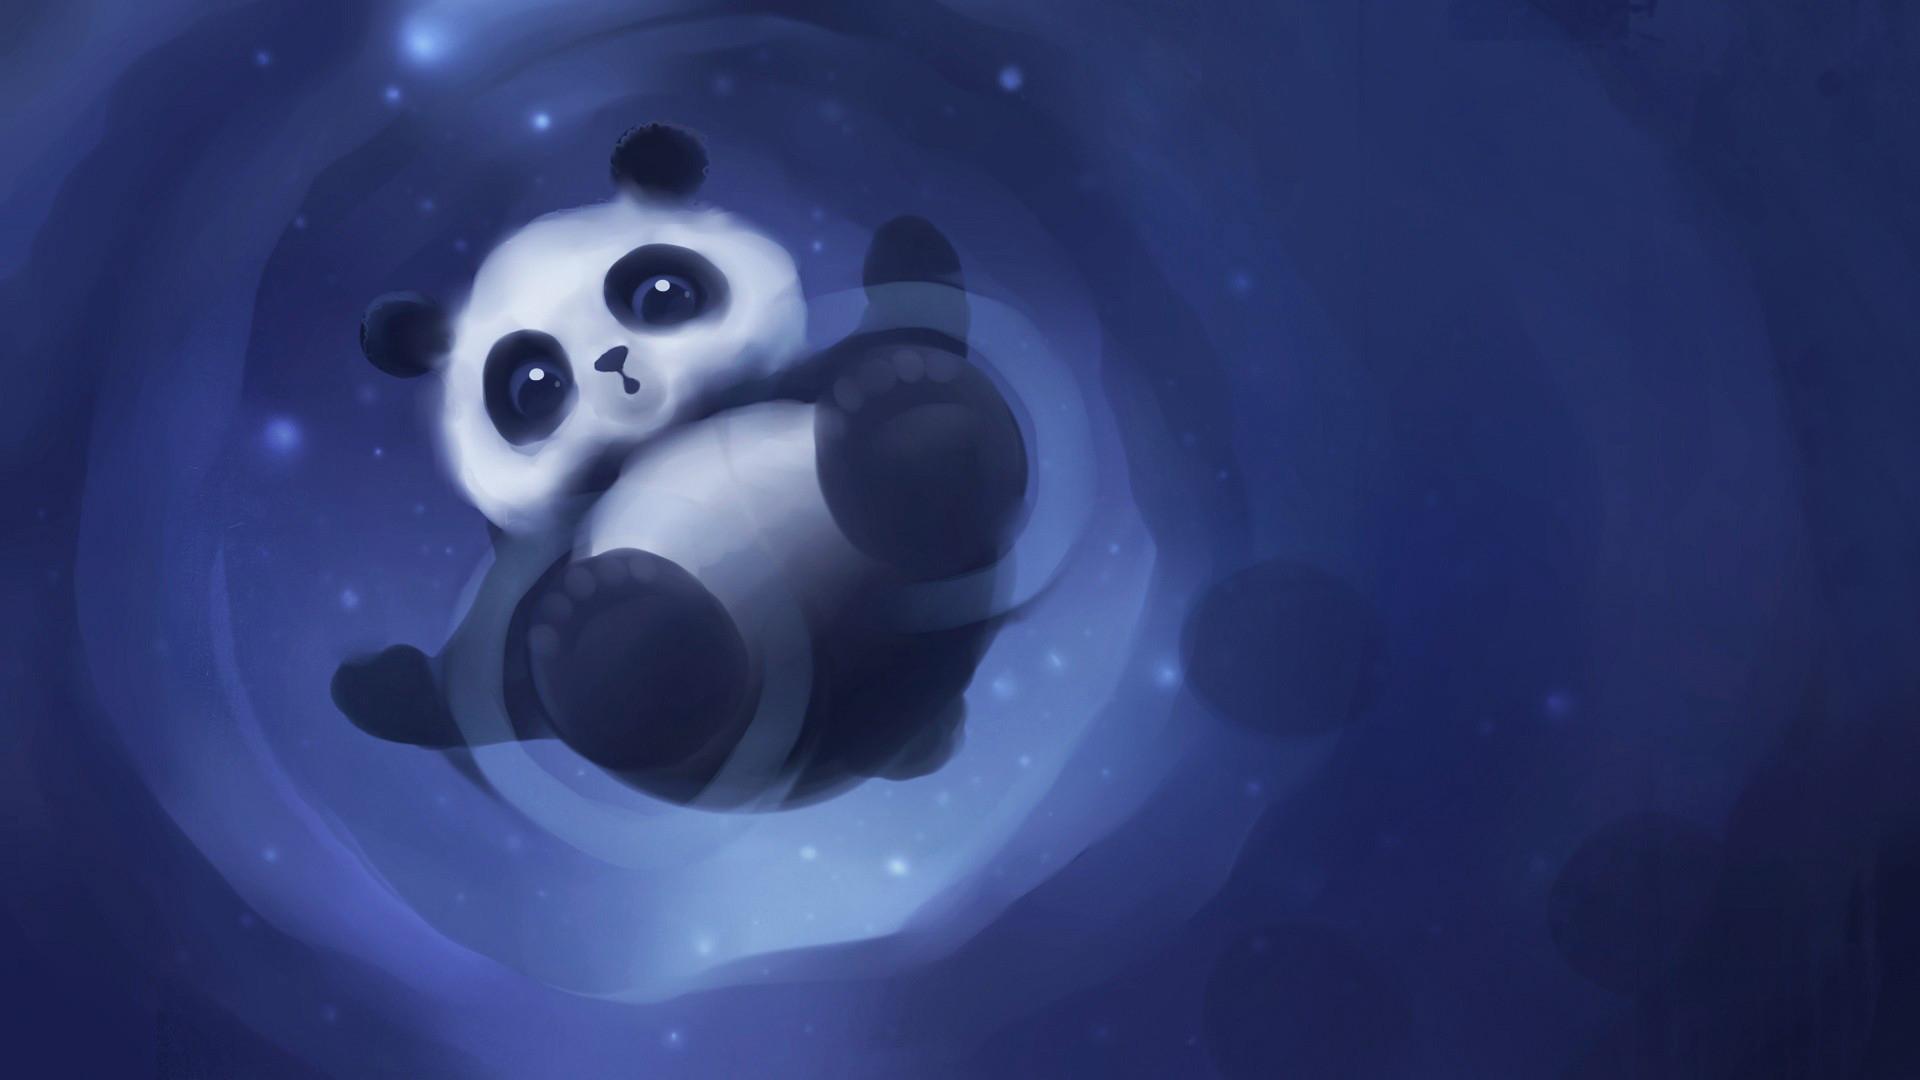 Anime Panda Wallpapers Desktop Background